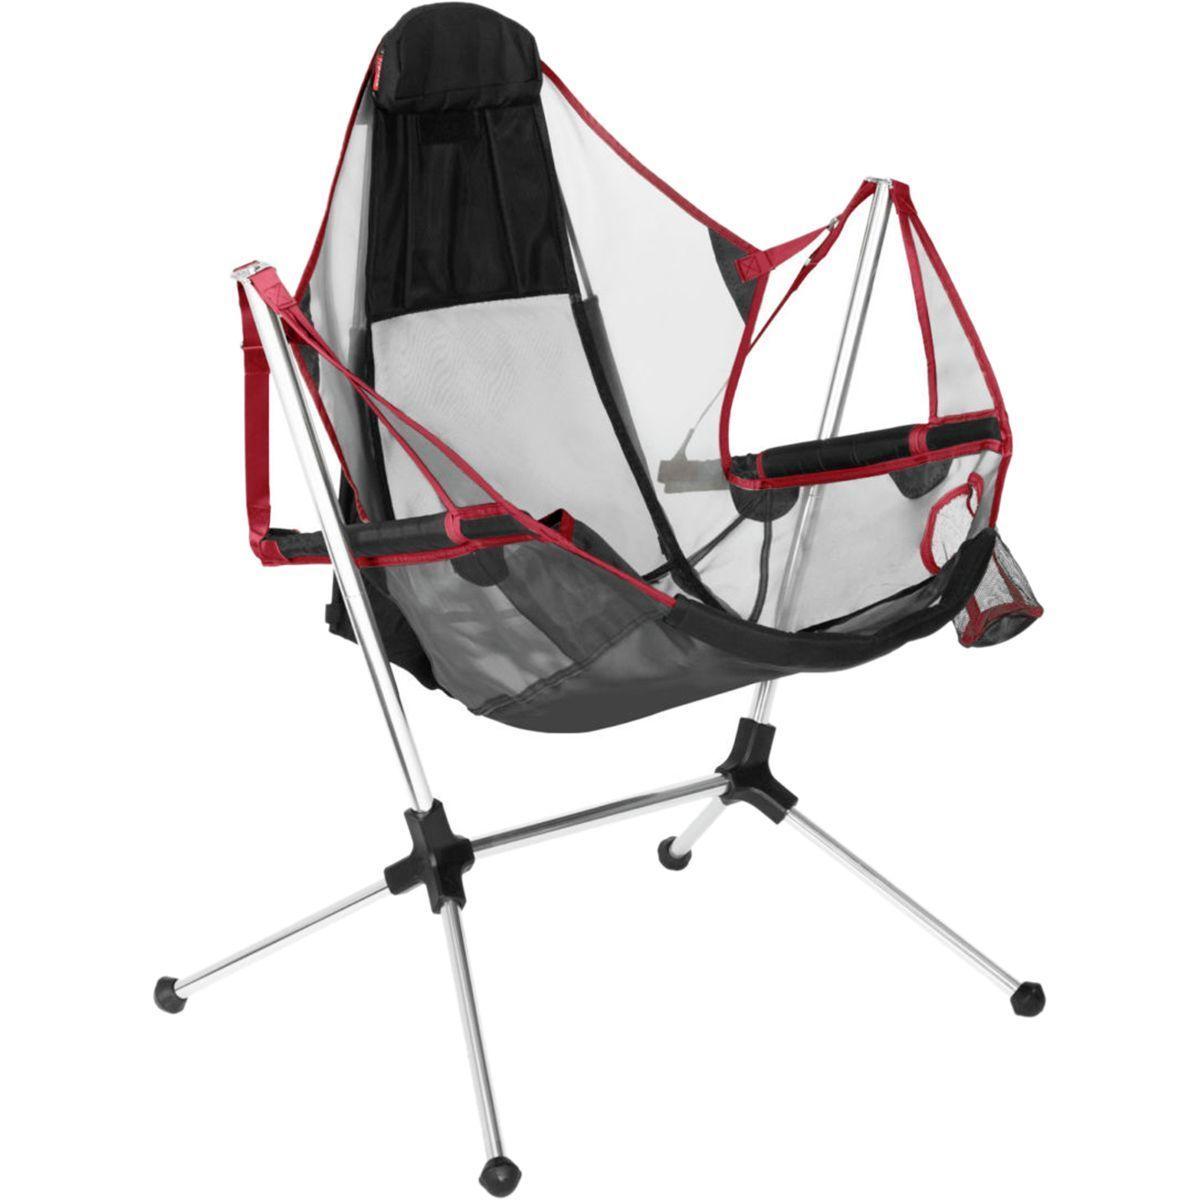 NEMO Equipment Inc. Stargaze Luxury Recliner Camp Chair